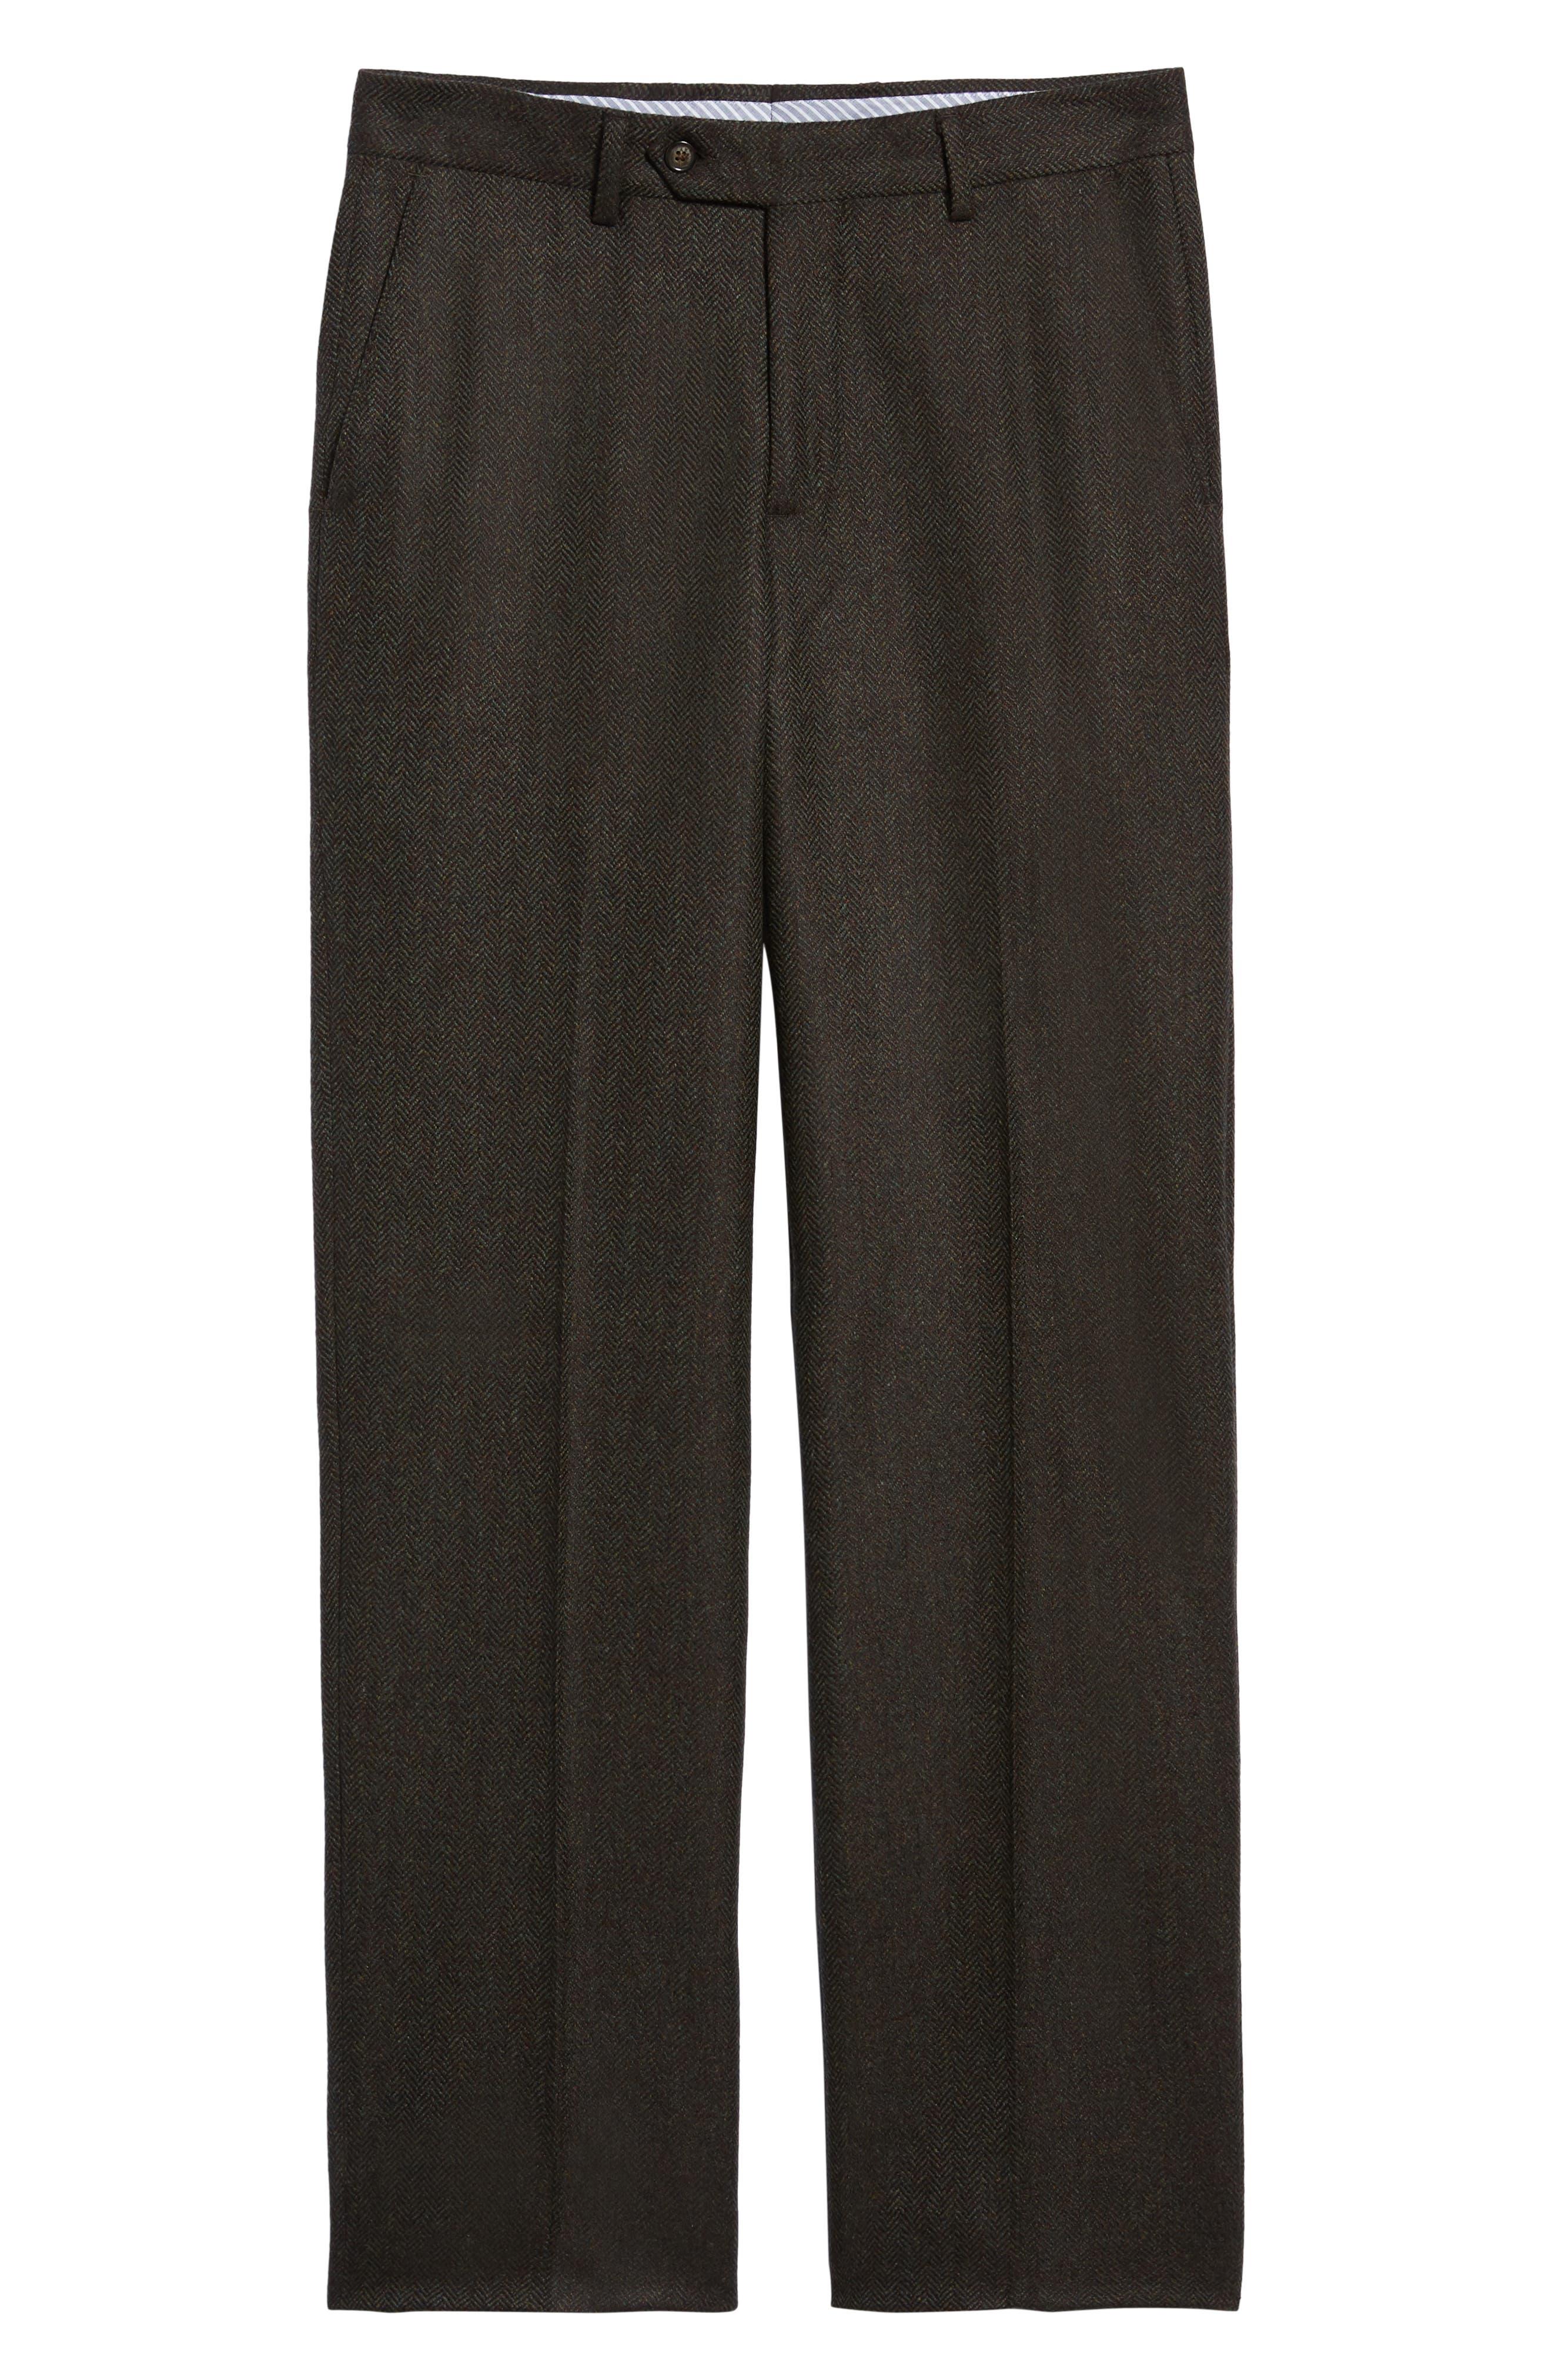 Flat Front Herringbone Wool & Cashmere Trousers,                             Alternate thumbnail 6, color,                             DARK OLIVE